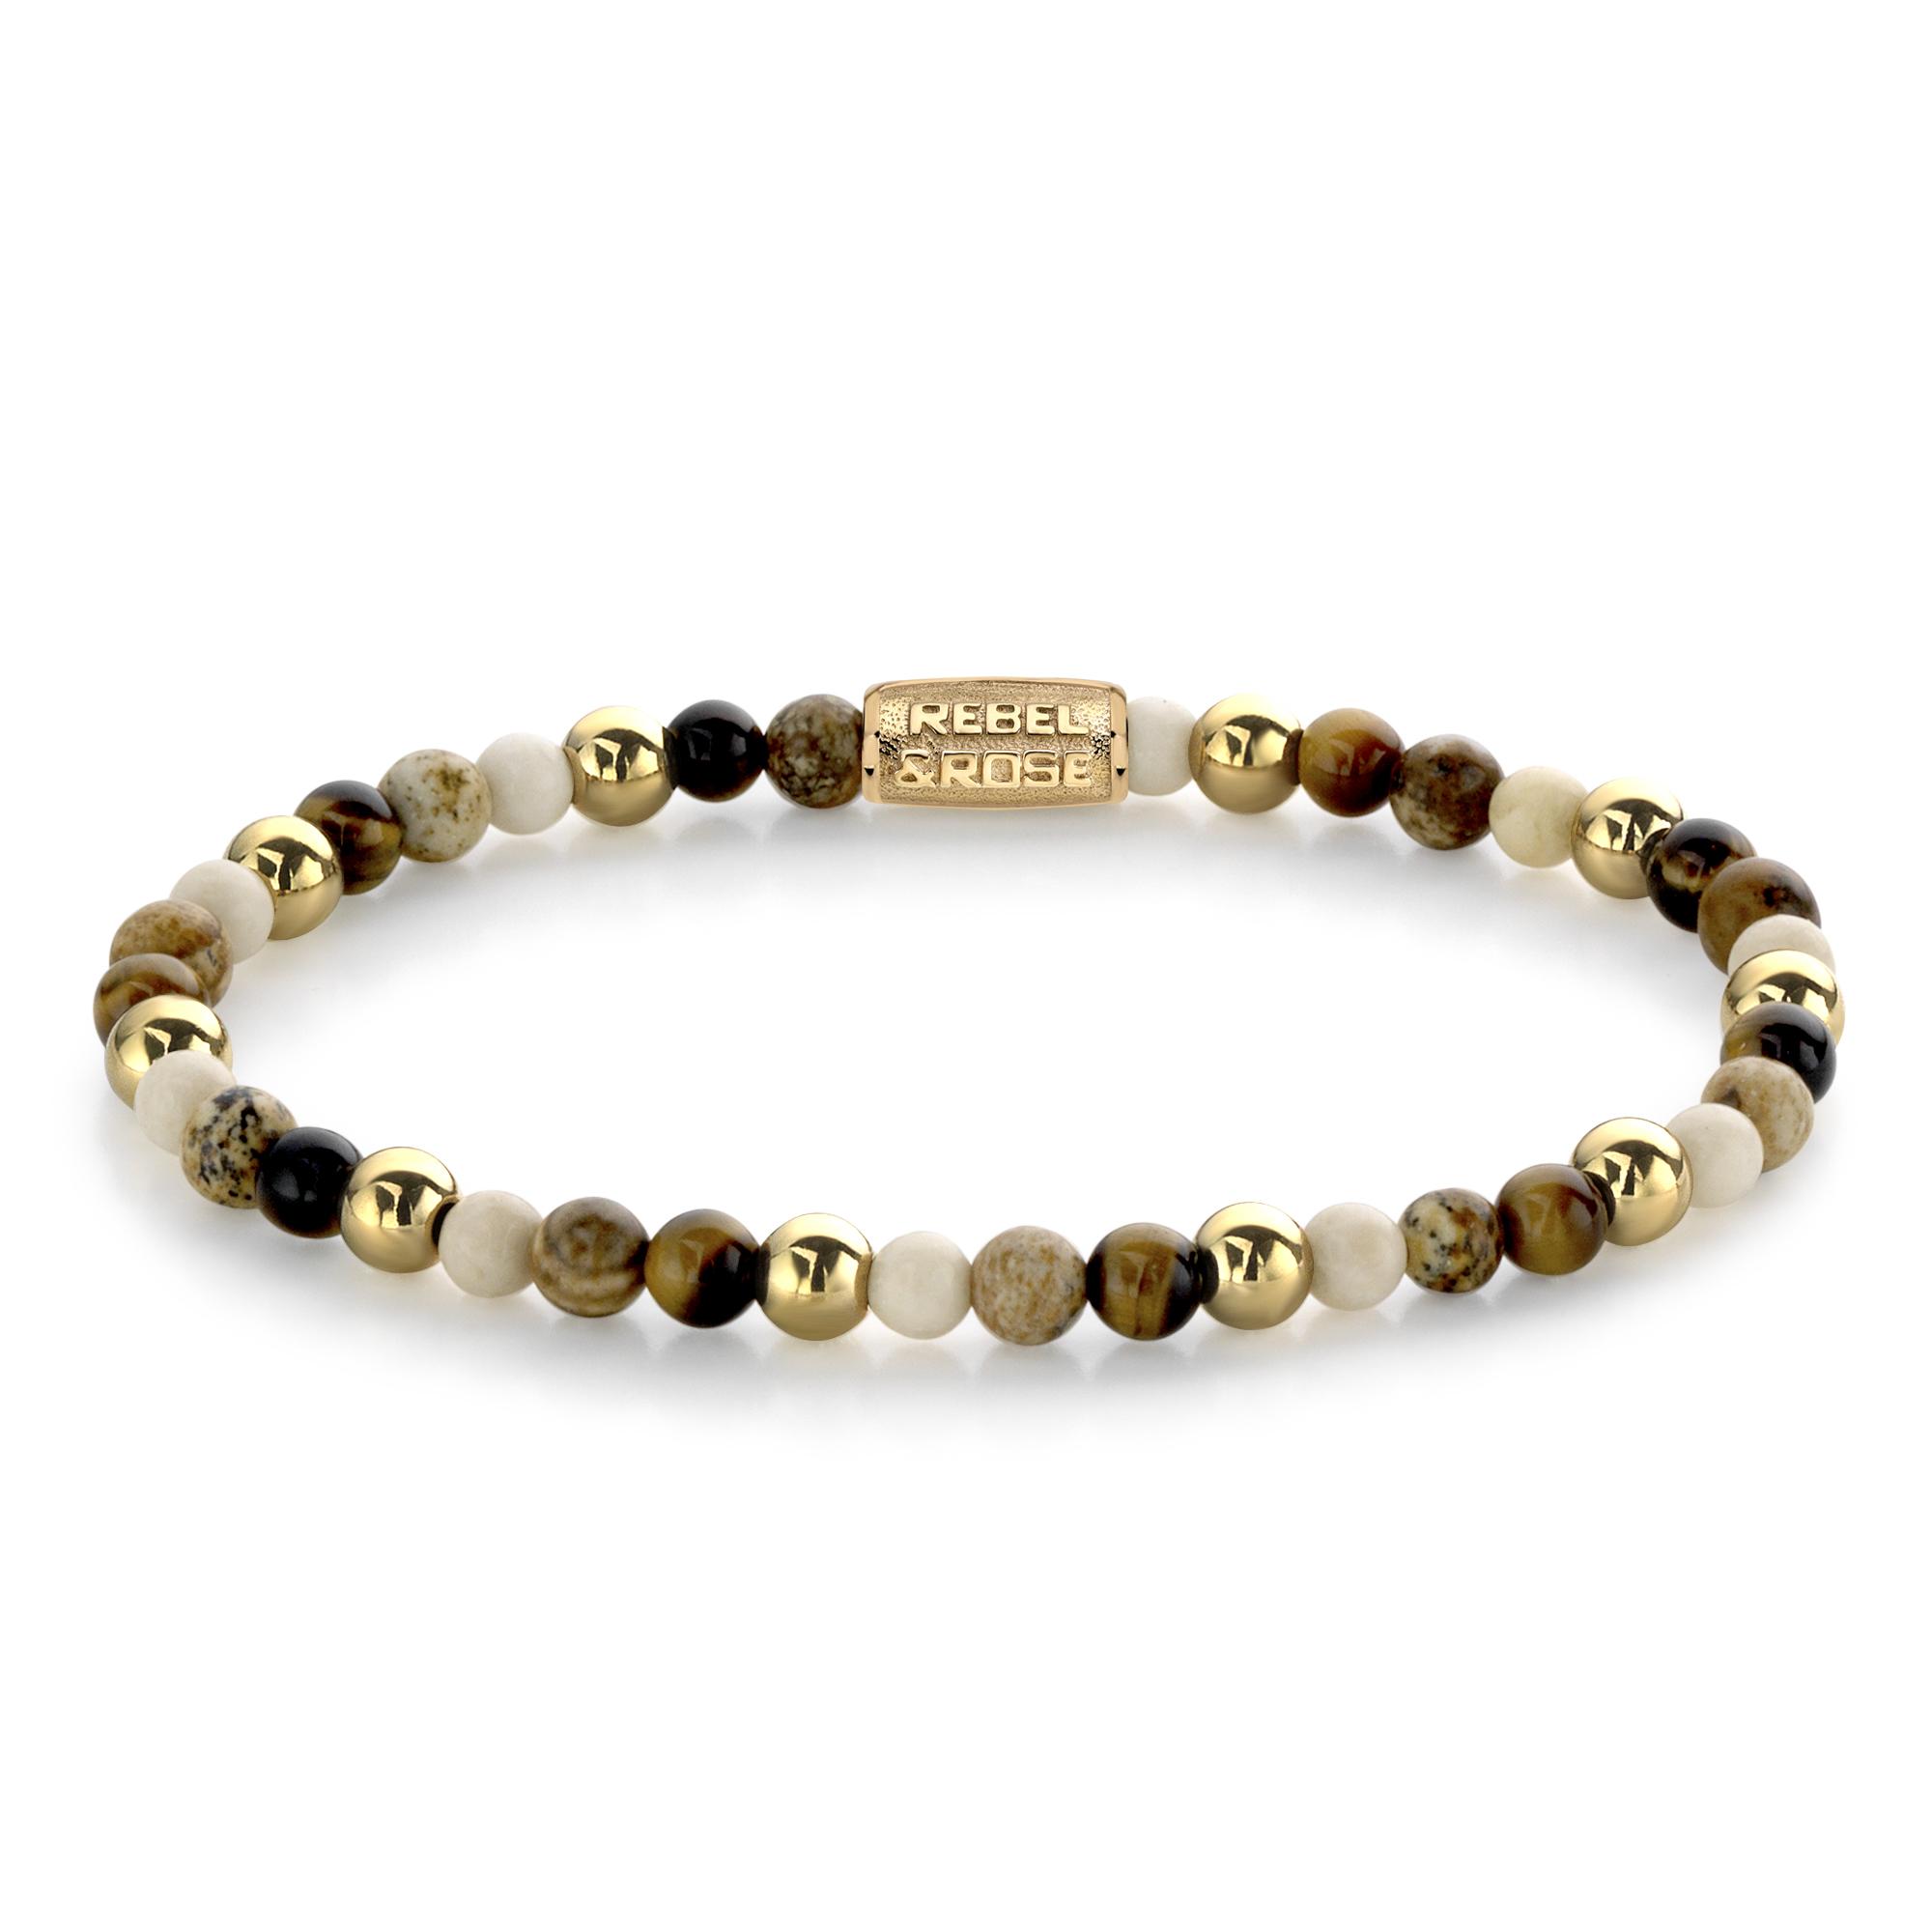 Rebel and Rose RR 40057 G Rekarmband Beads Autumn Love bruin beige goudkleurig 4 mm XS 15 cm